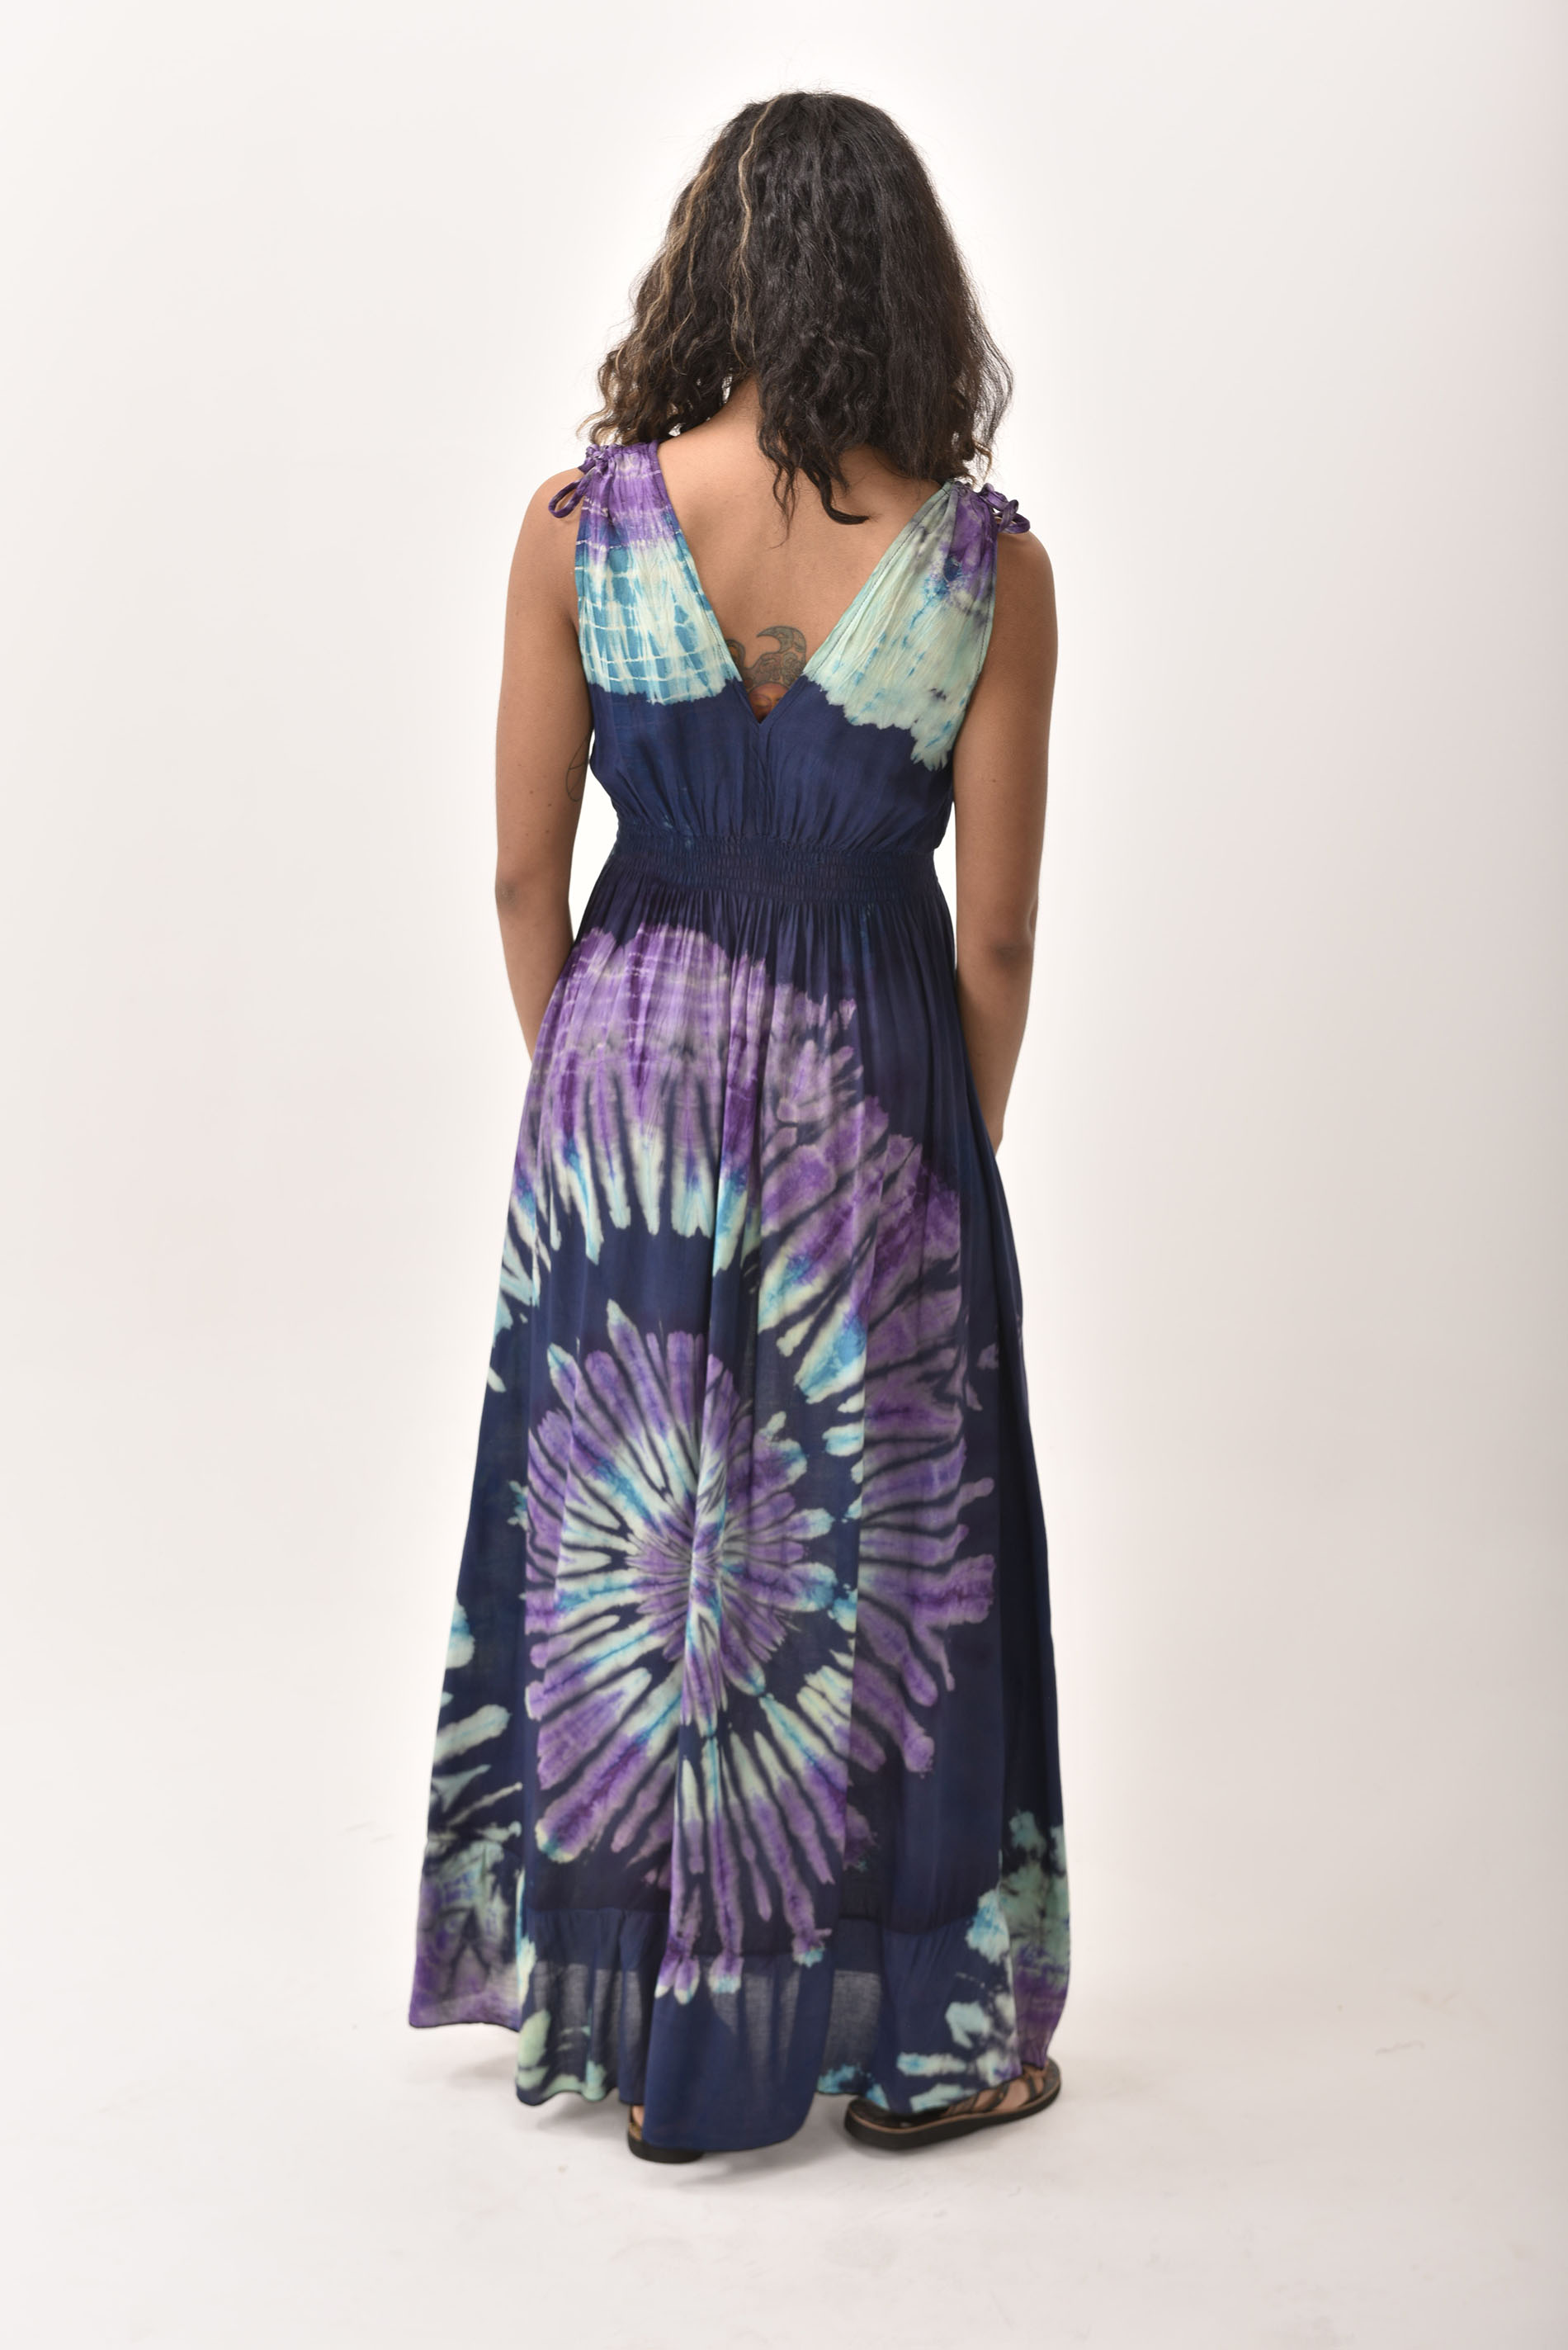 V-Neck Maxi Dress Hand Painted Tie Dye, Blue Purple